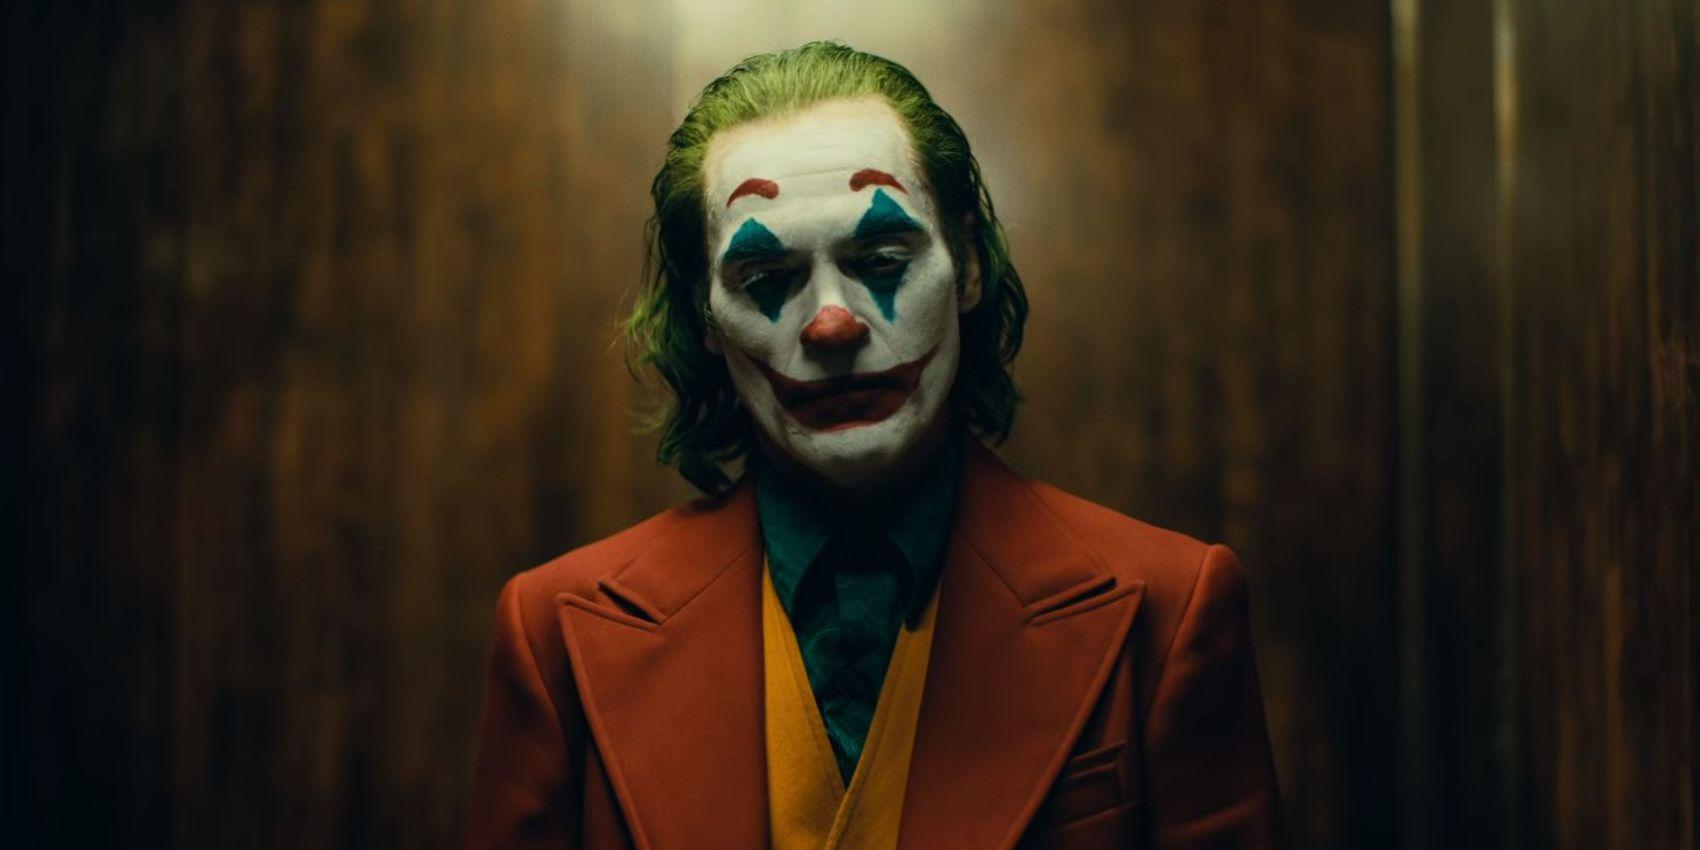 'Joker' trailer released; DC's iconic Batman villain takes the lead